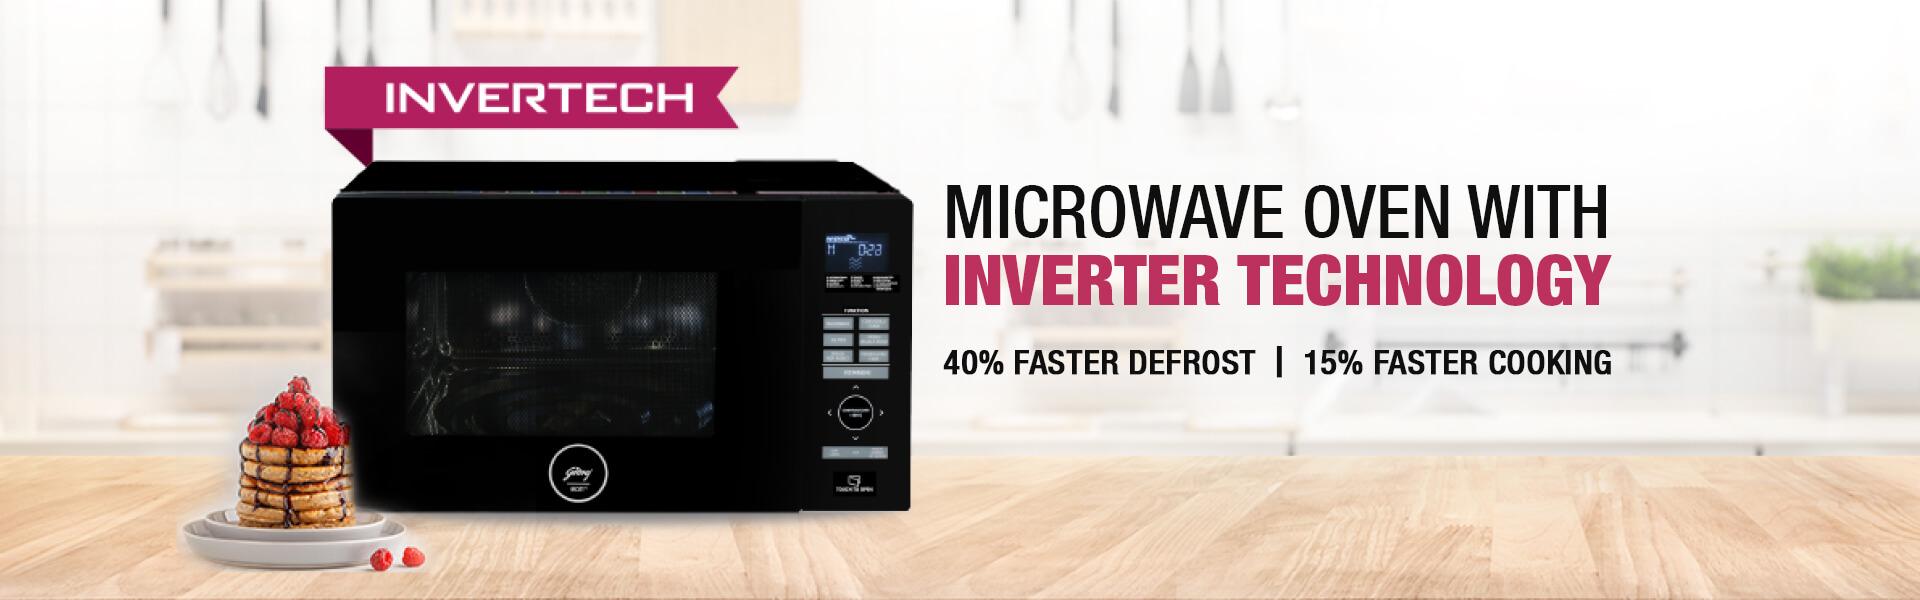 Godrej Microwave Oven Invertech